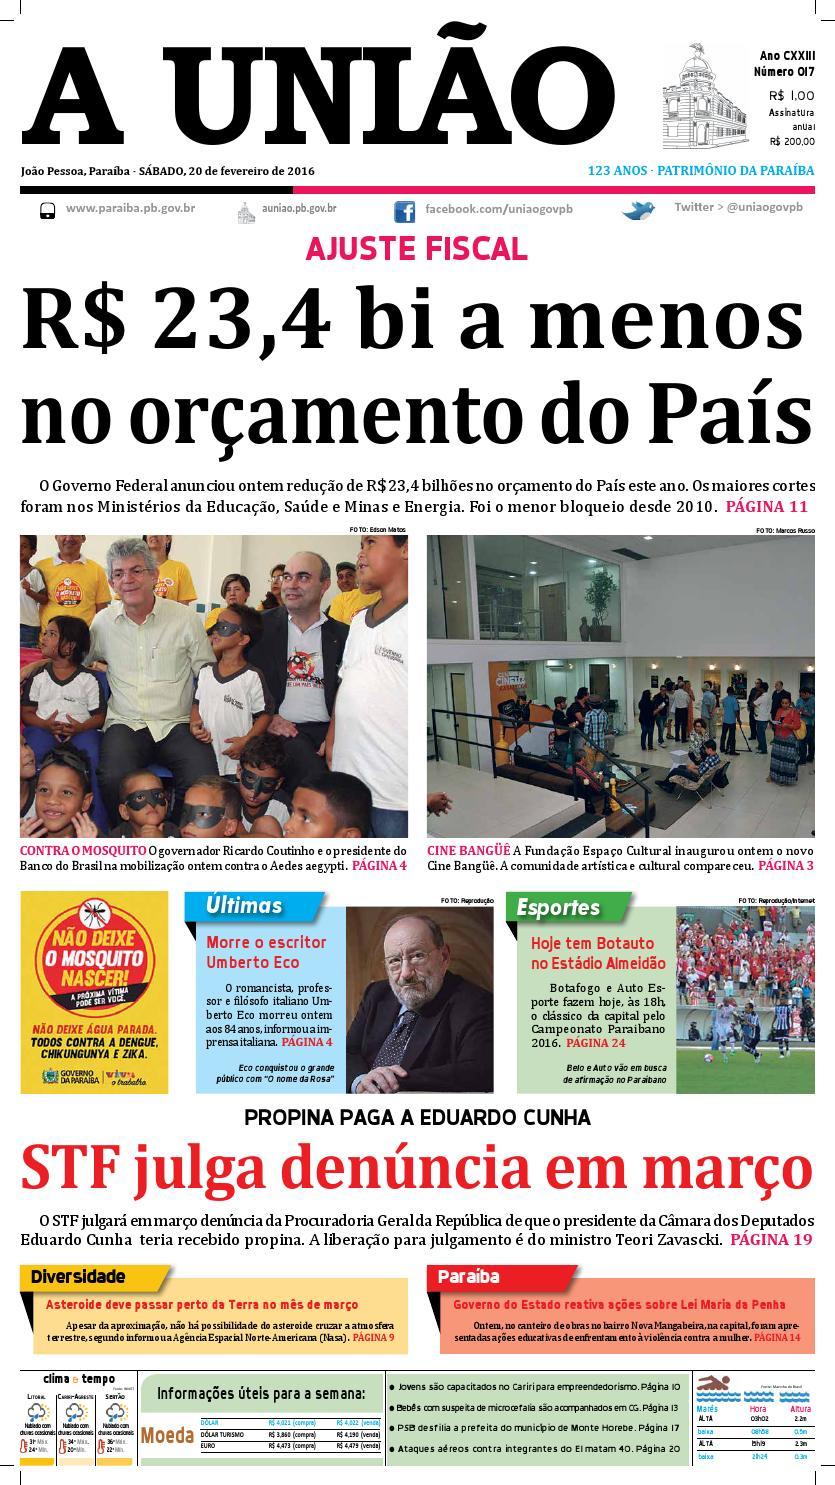 Jornal A União 20 02 16 by Jornal A União - issuu 3847f4b0228b1